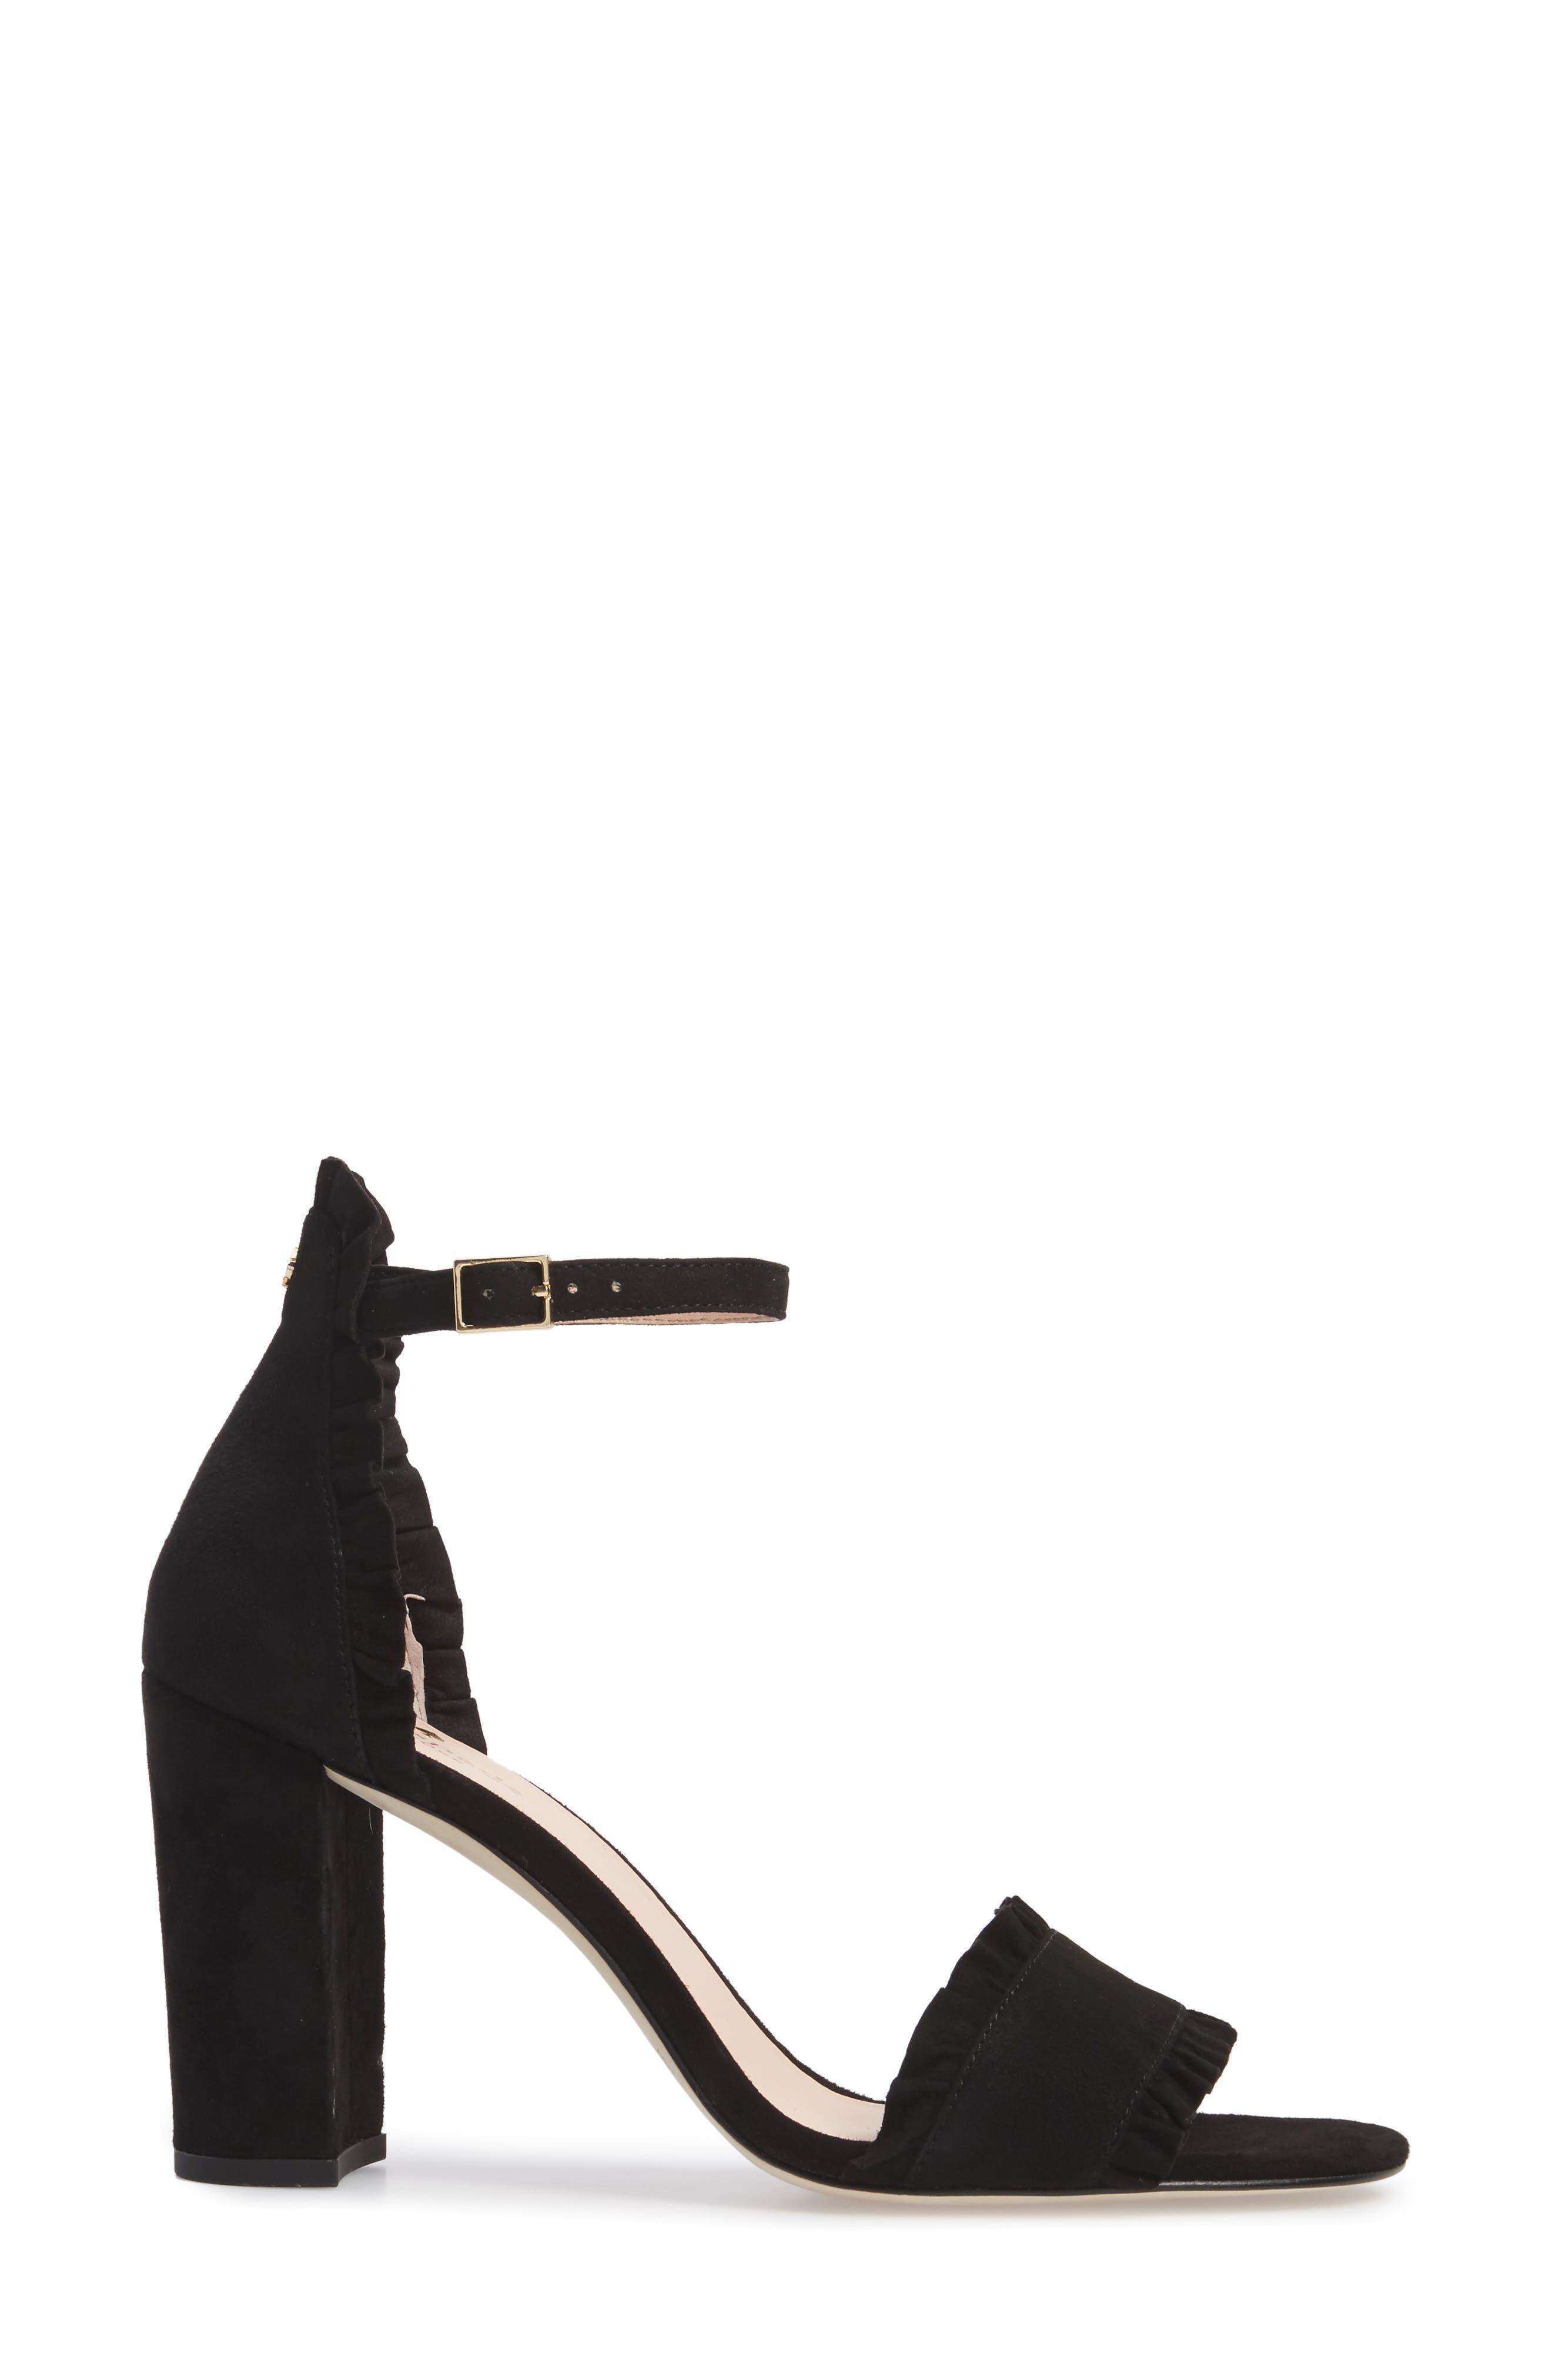 odele ruffle sandal,                             Alternate thumbnail 3, color,                             Black Suede